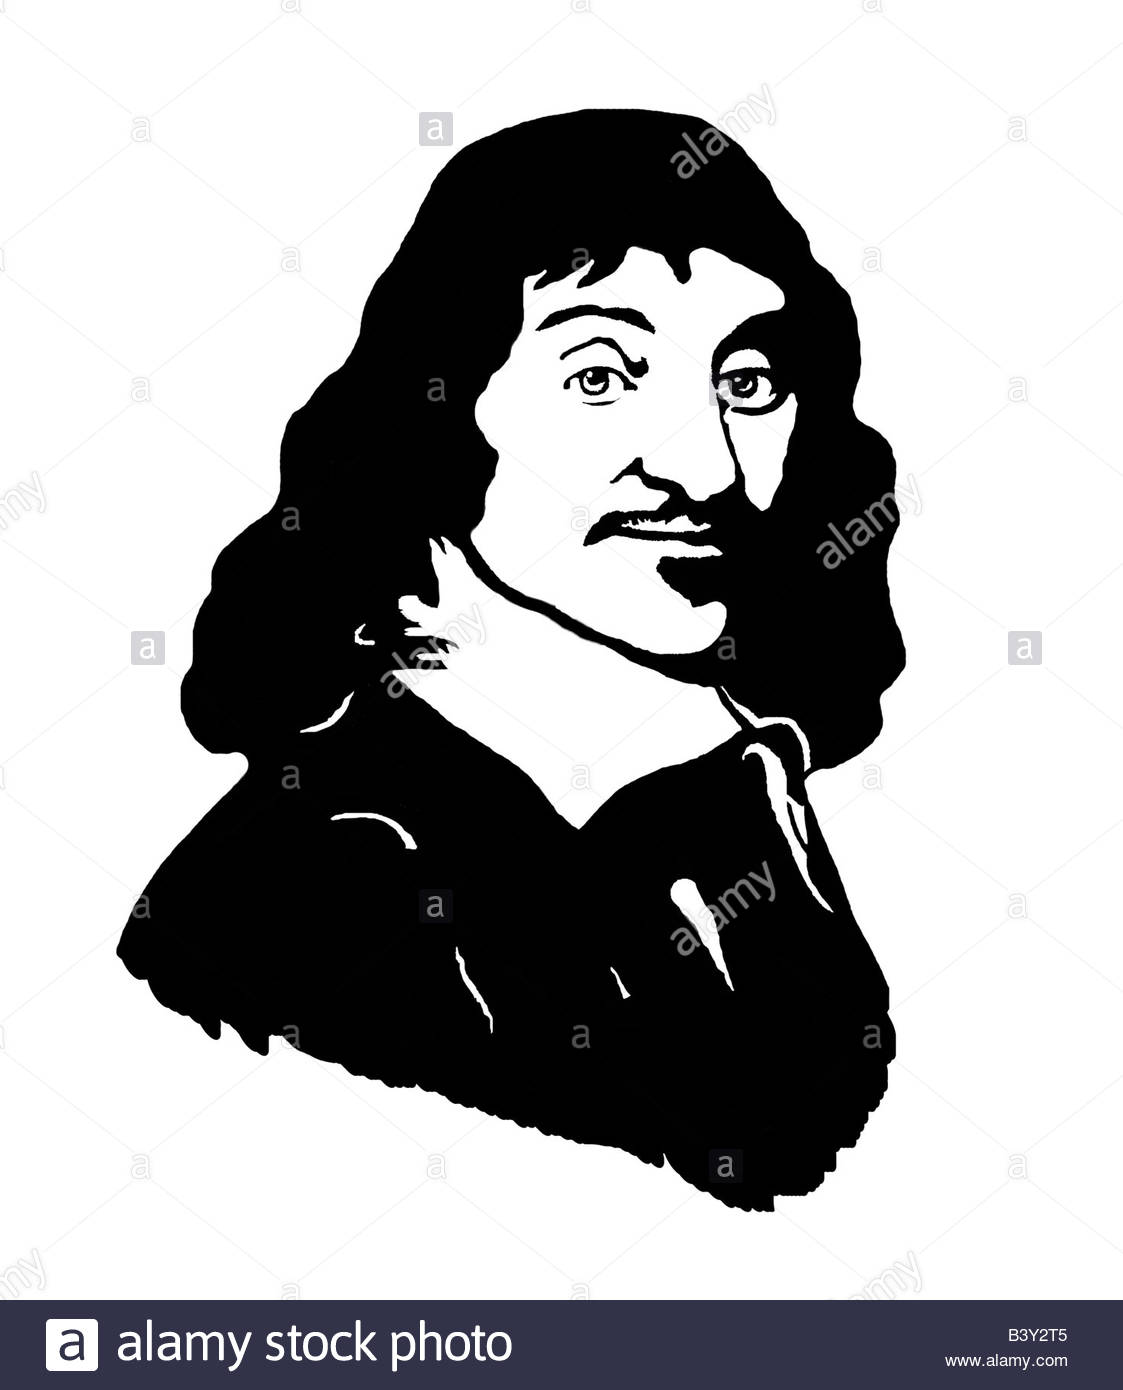 René Descartes 1596 1650 French Philosopher Mathematician Poster Style Modern Illustration Stock Photo